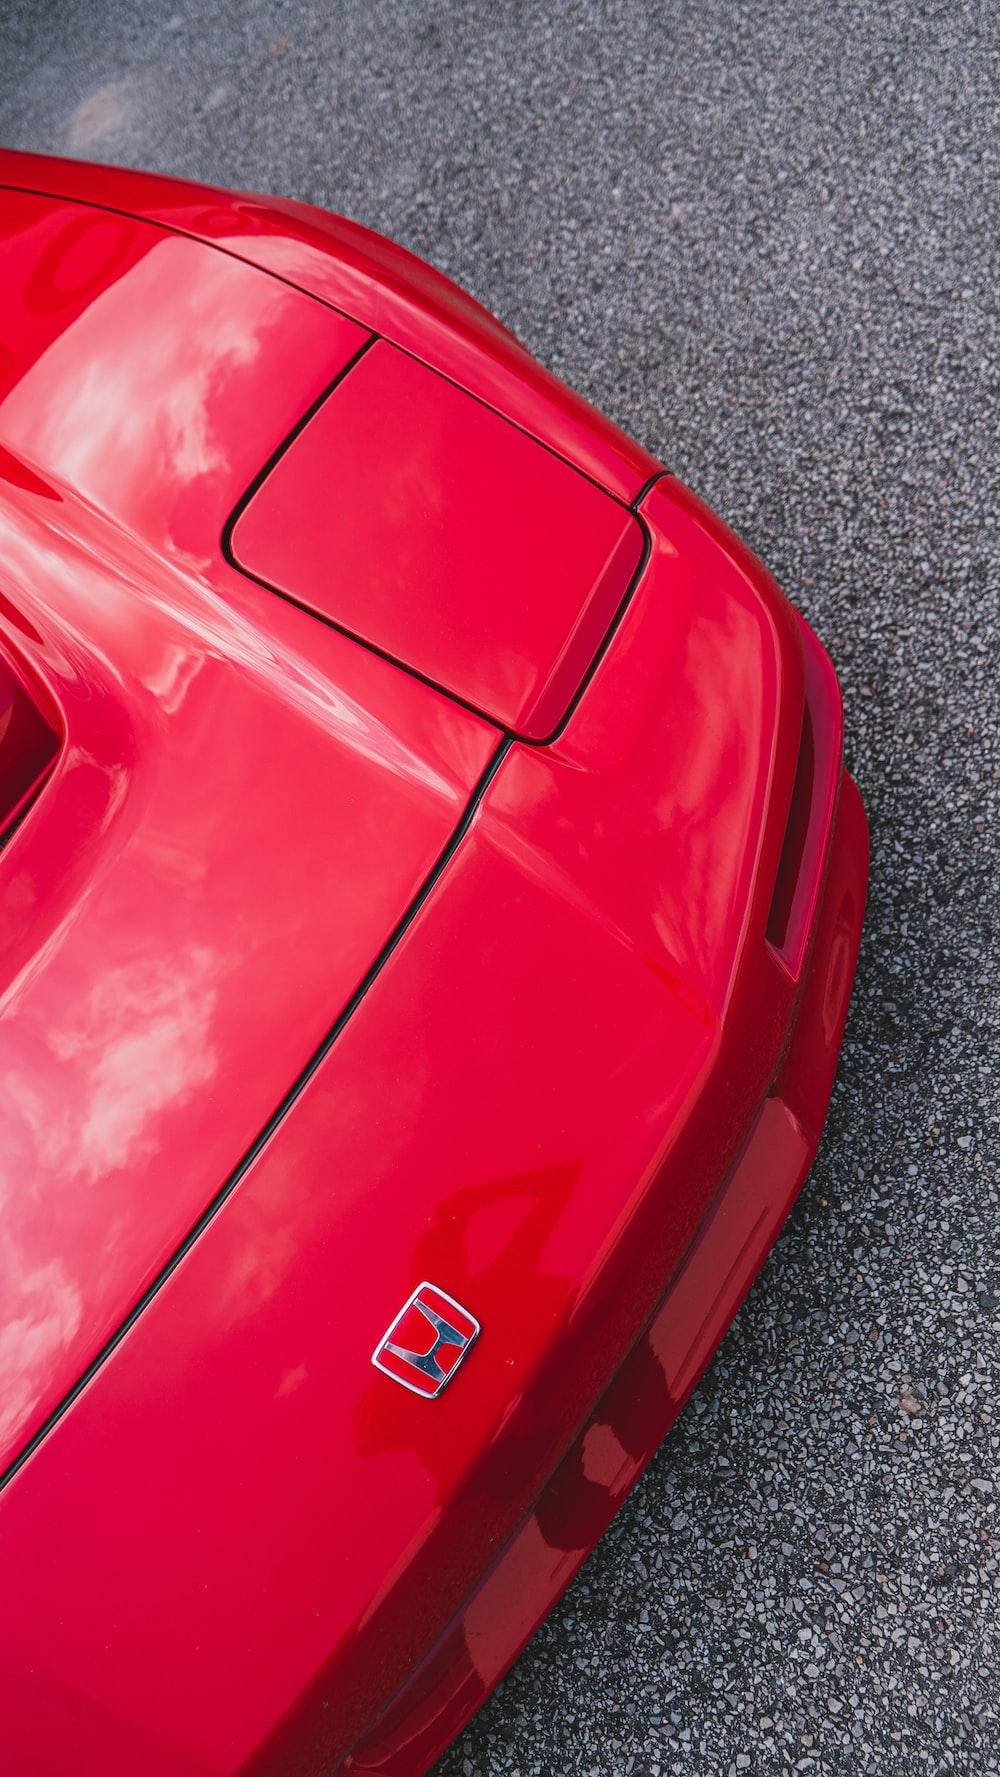 red porsche 911 on grey concrete pavement